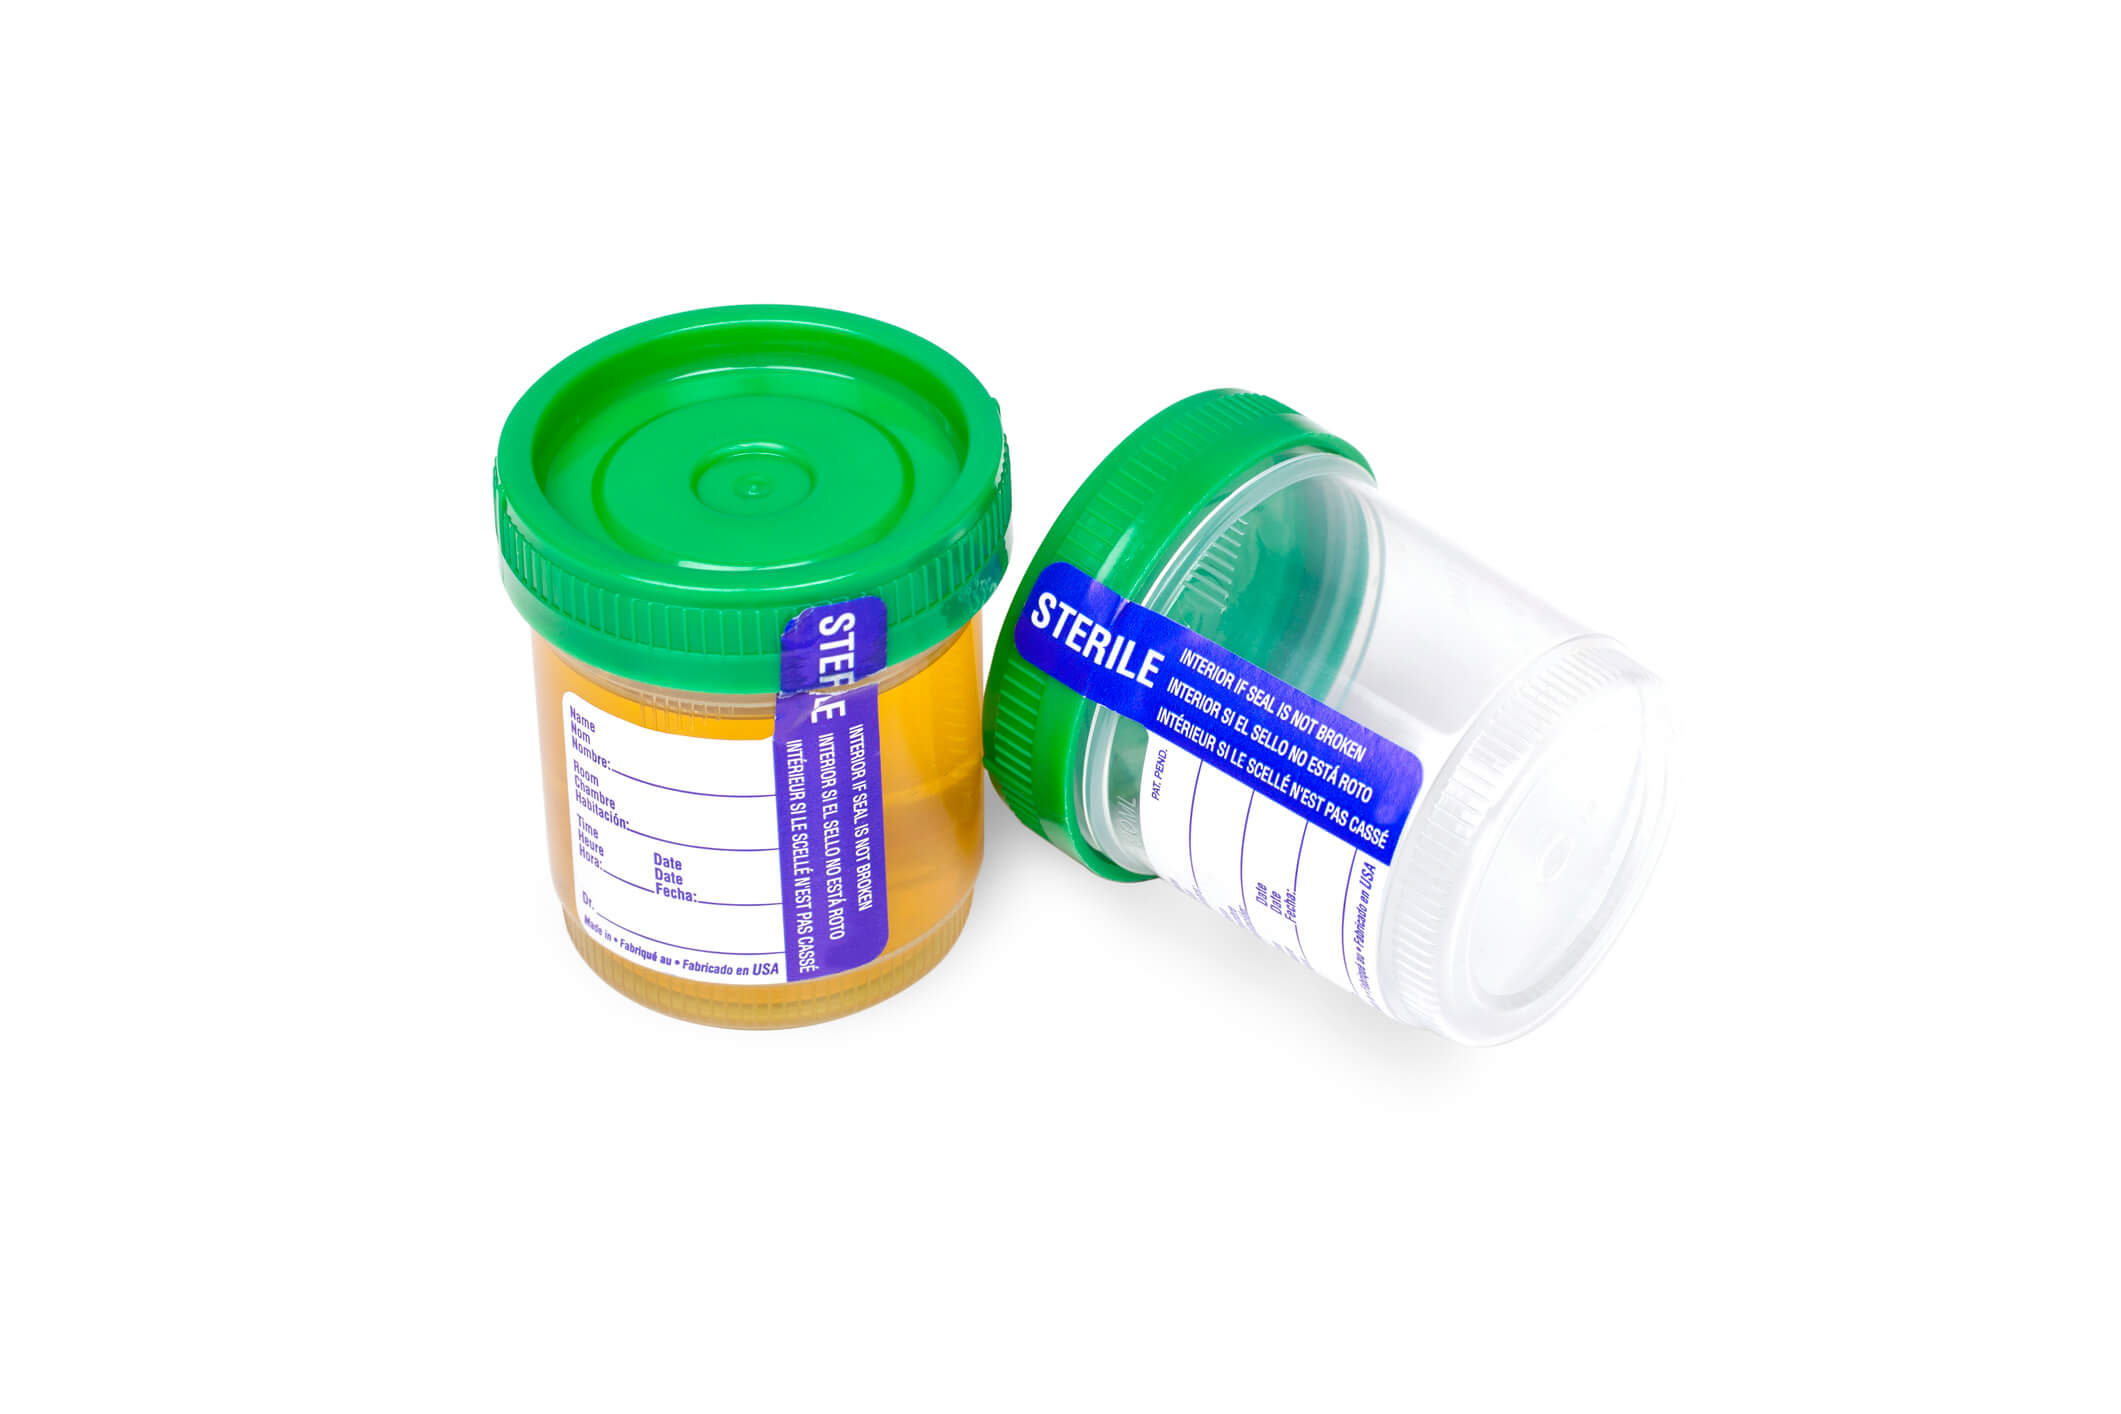 Image: urine sample cups